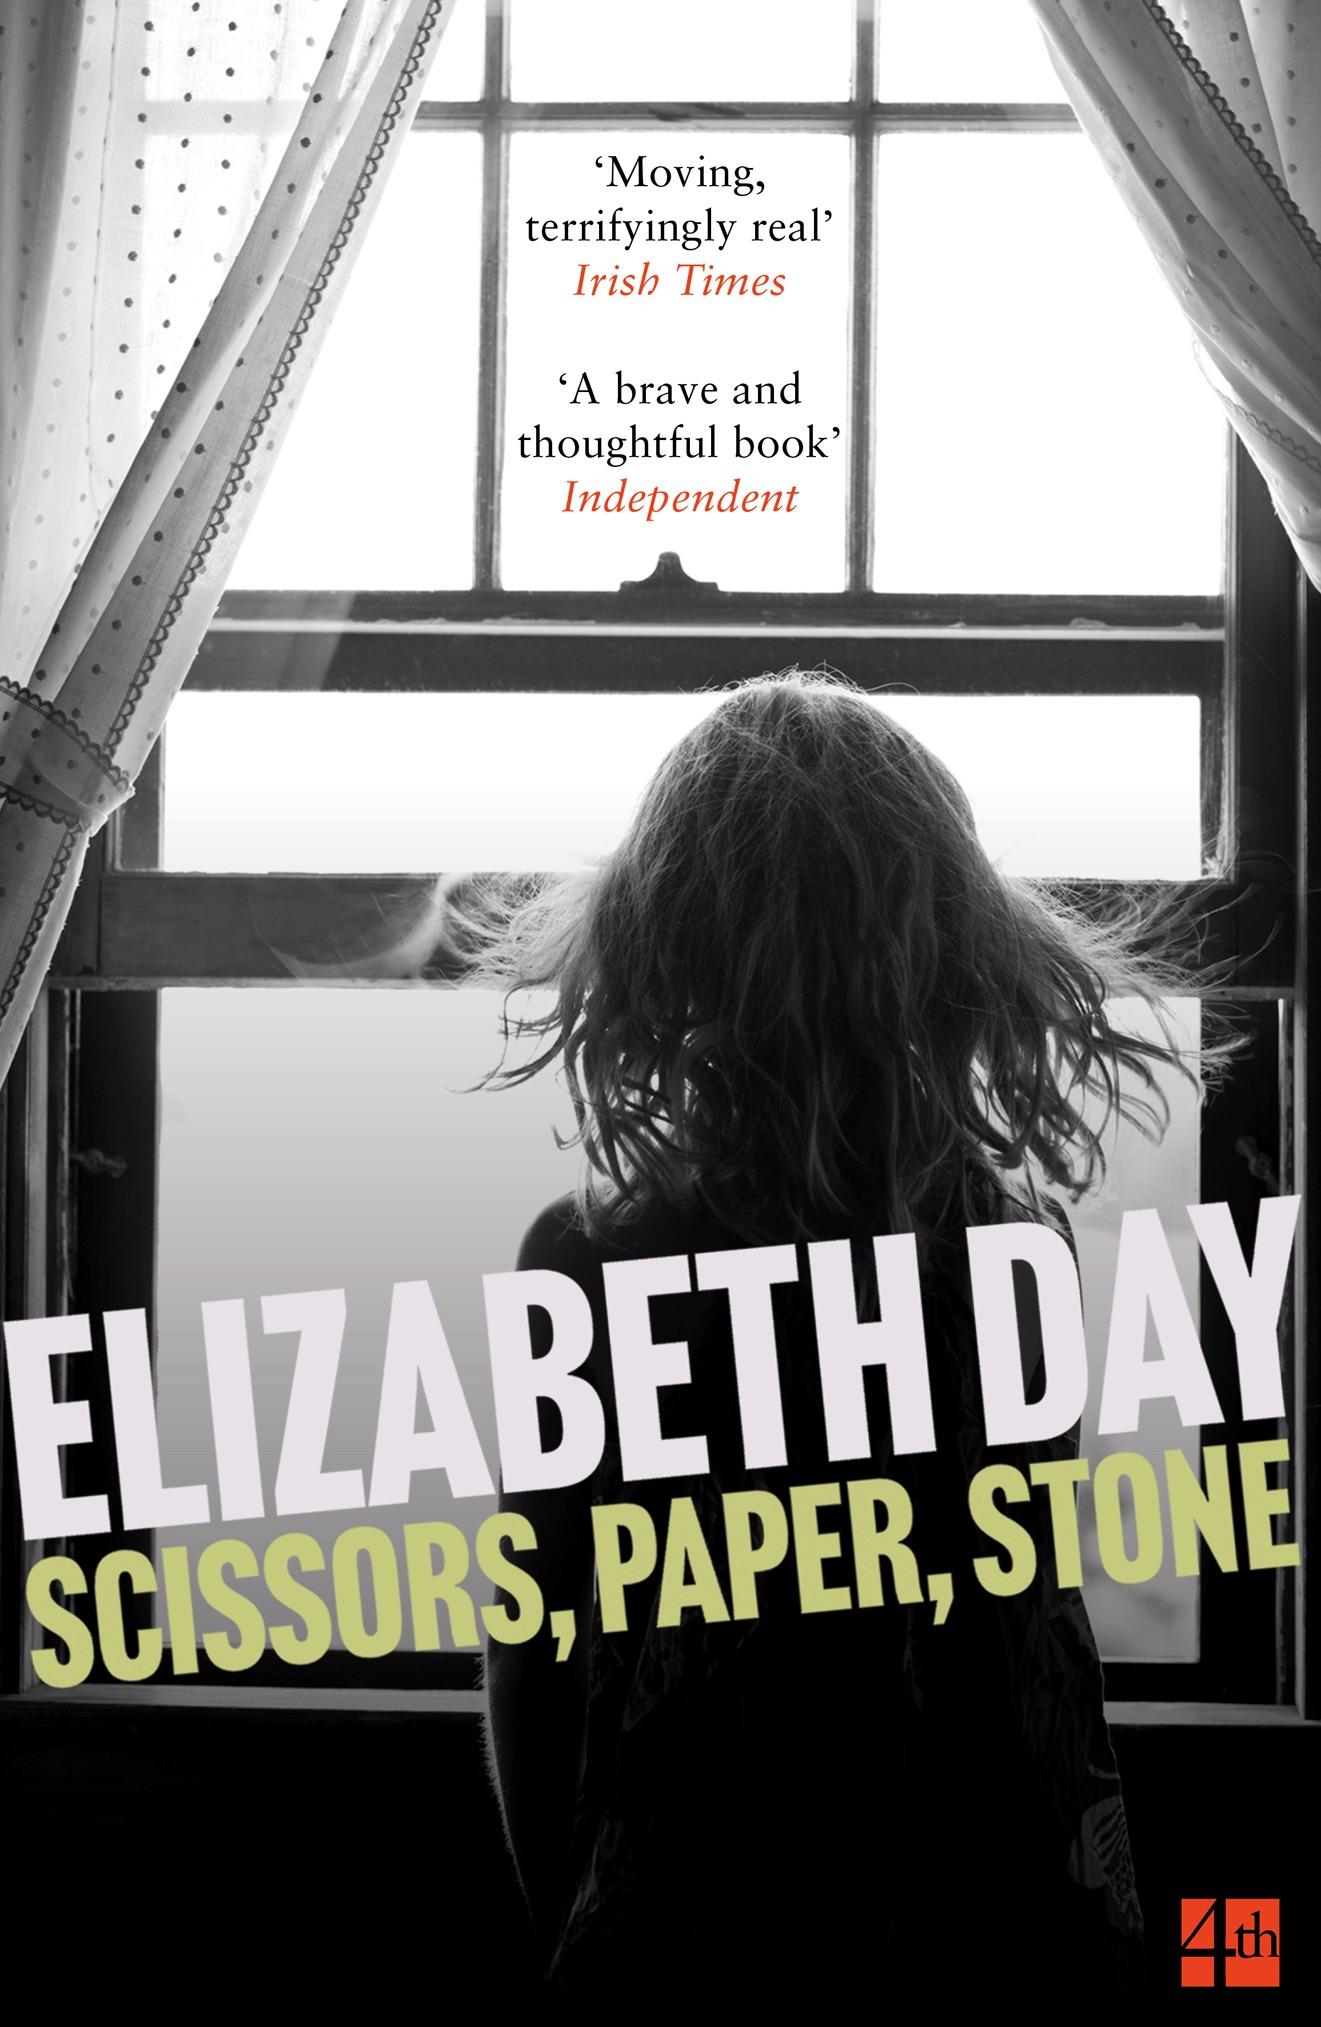 Scissors, Paper, Stone - by award winning author Elizabeth Day